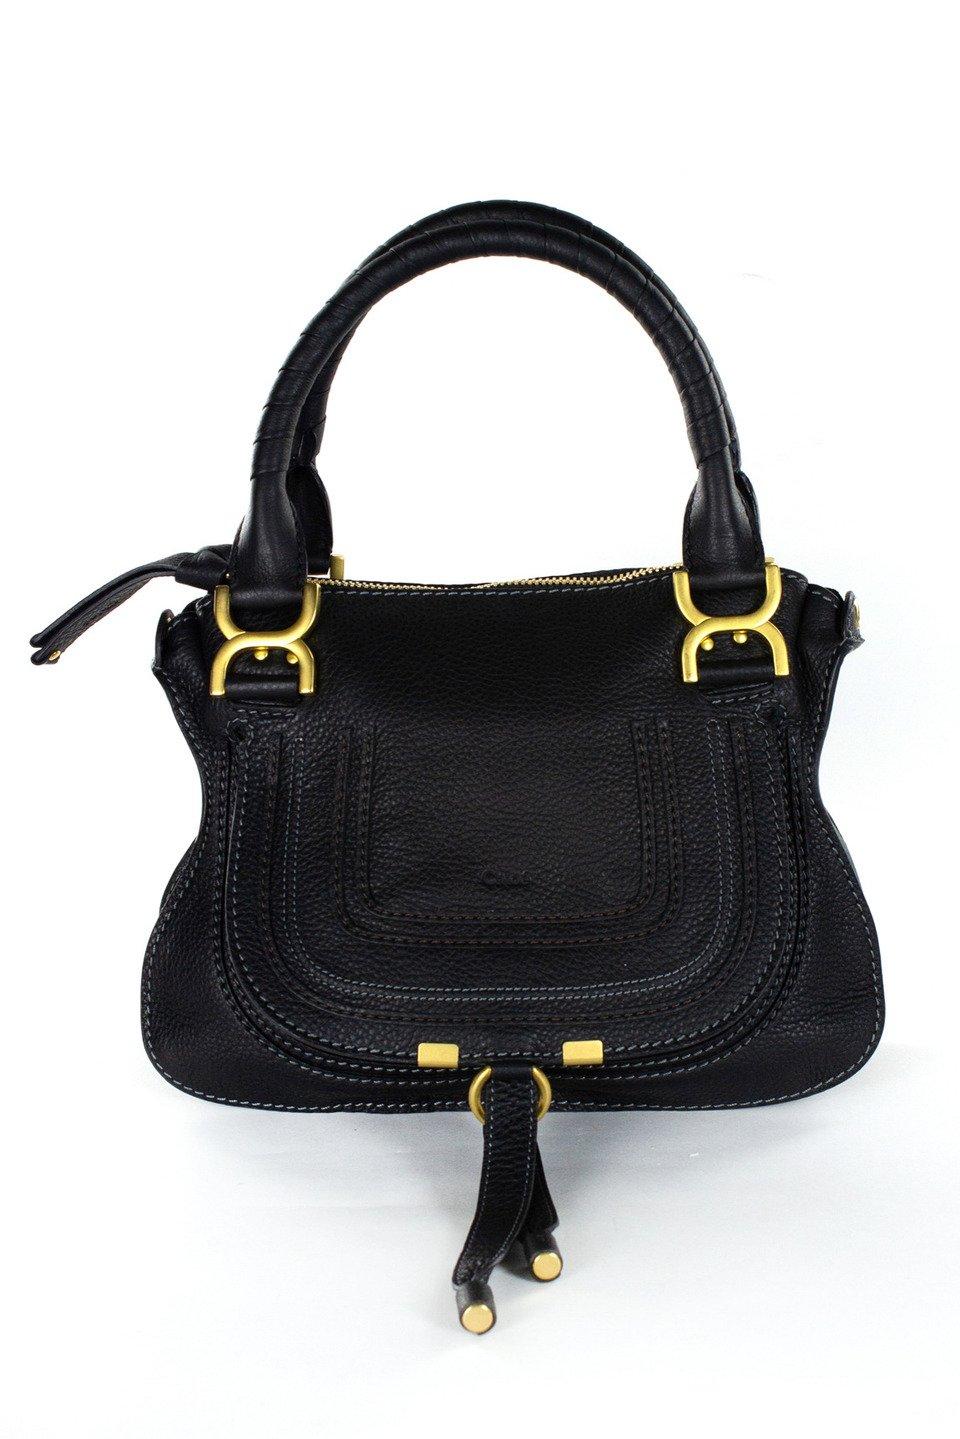 Chloe Leather Handbag IV in Black